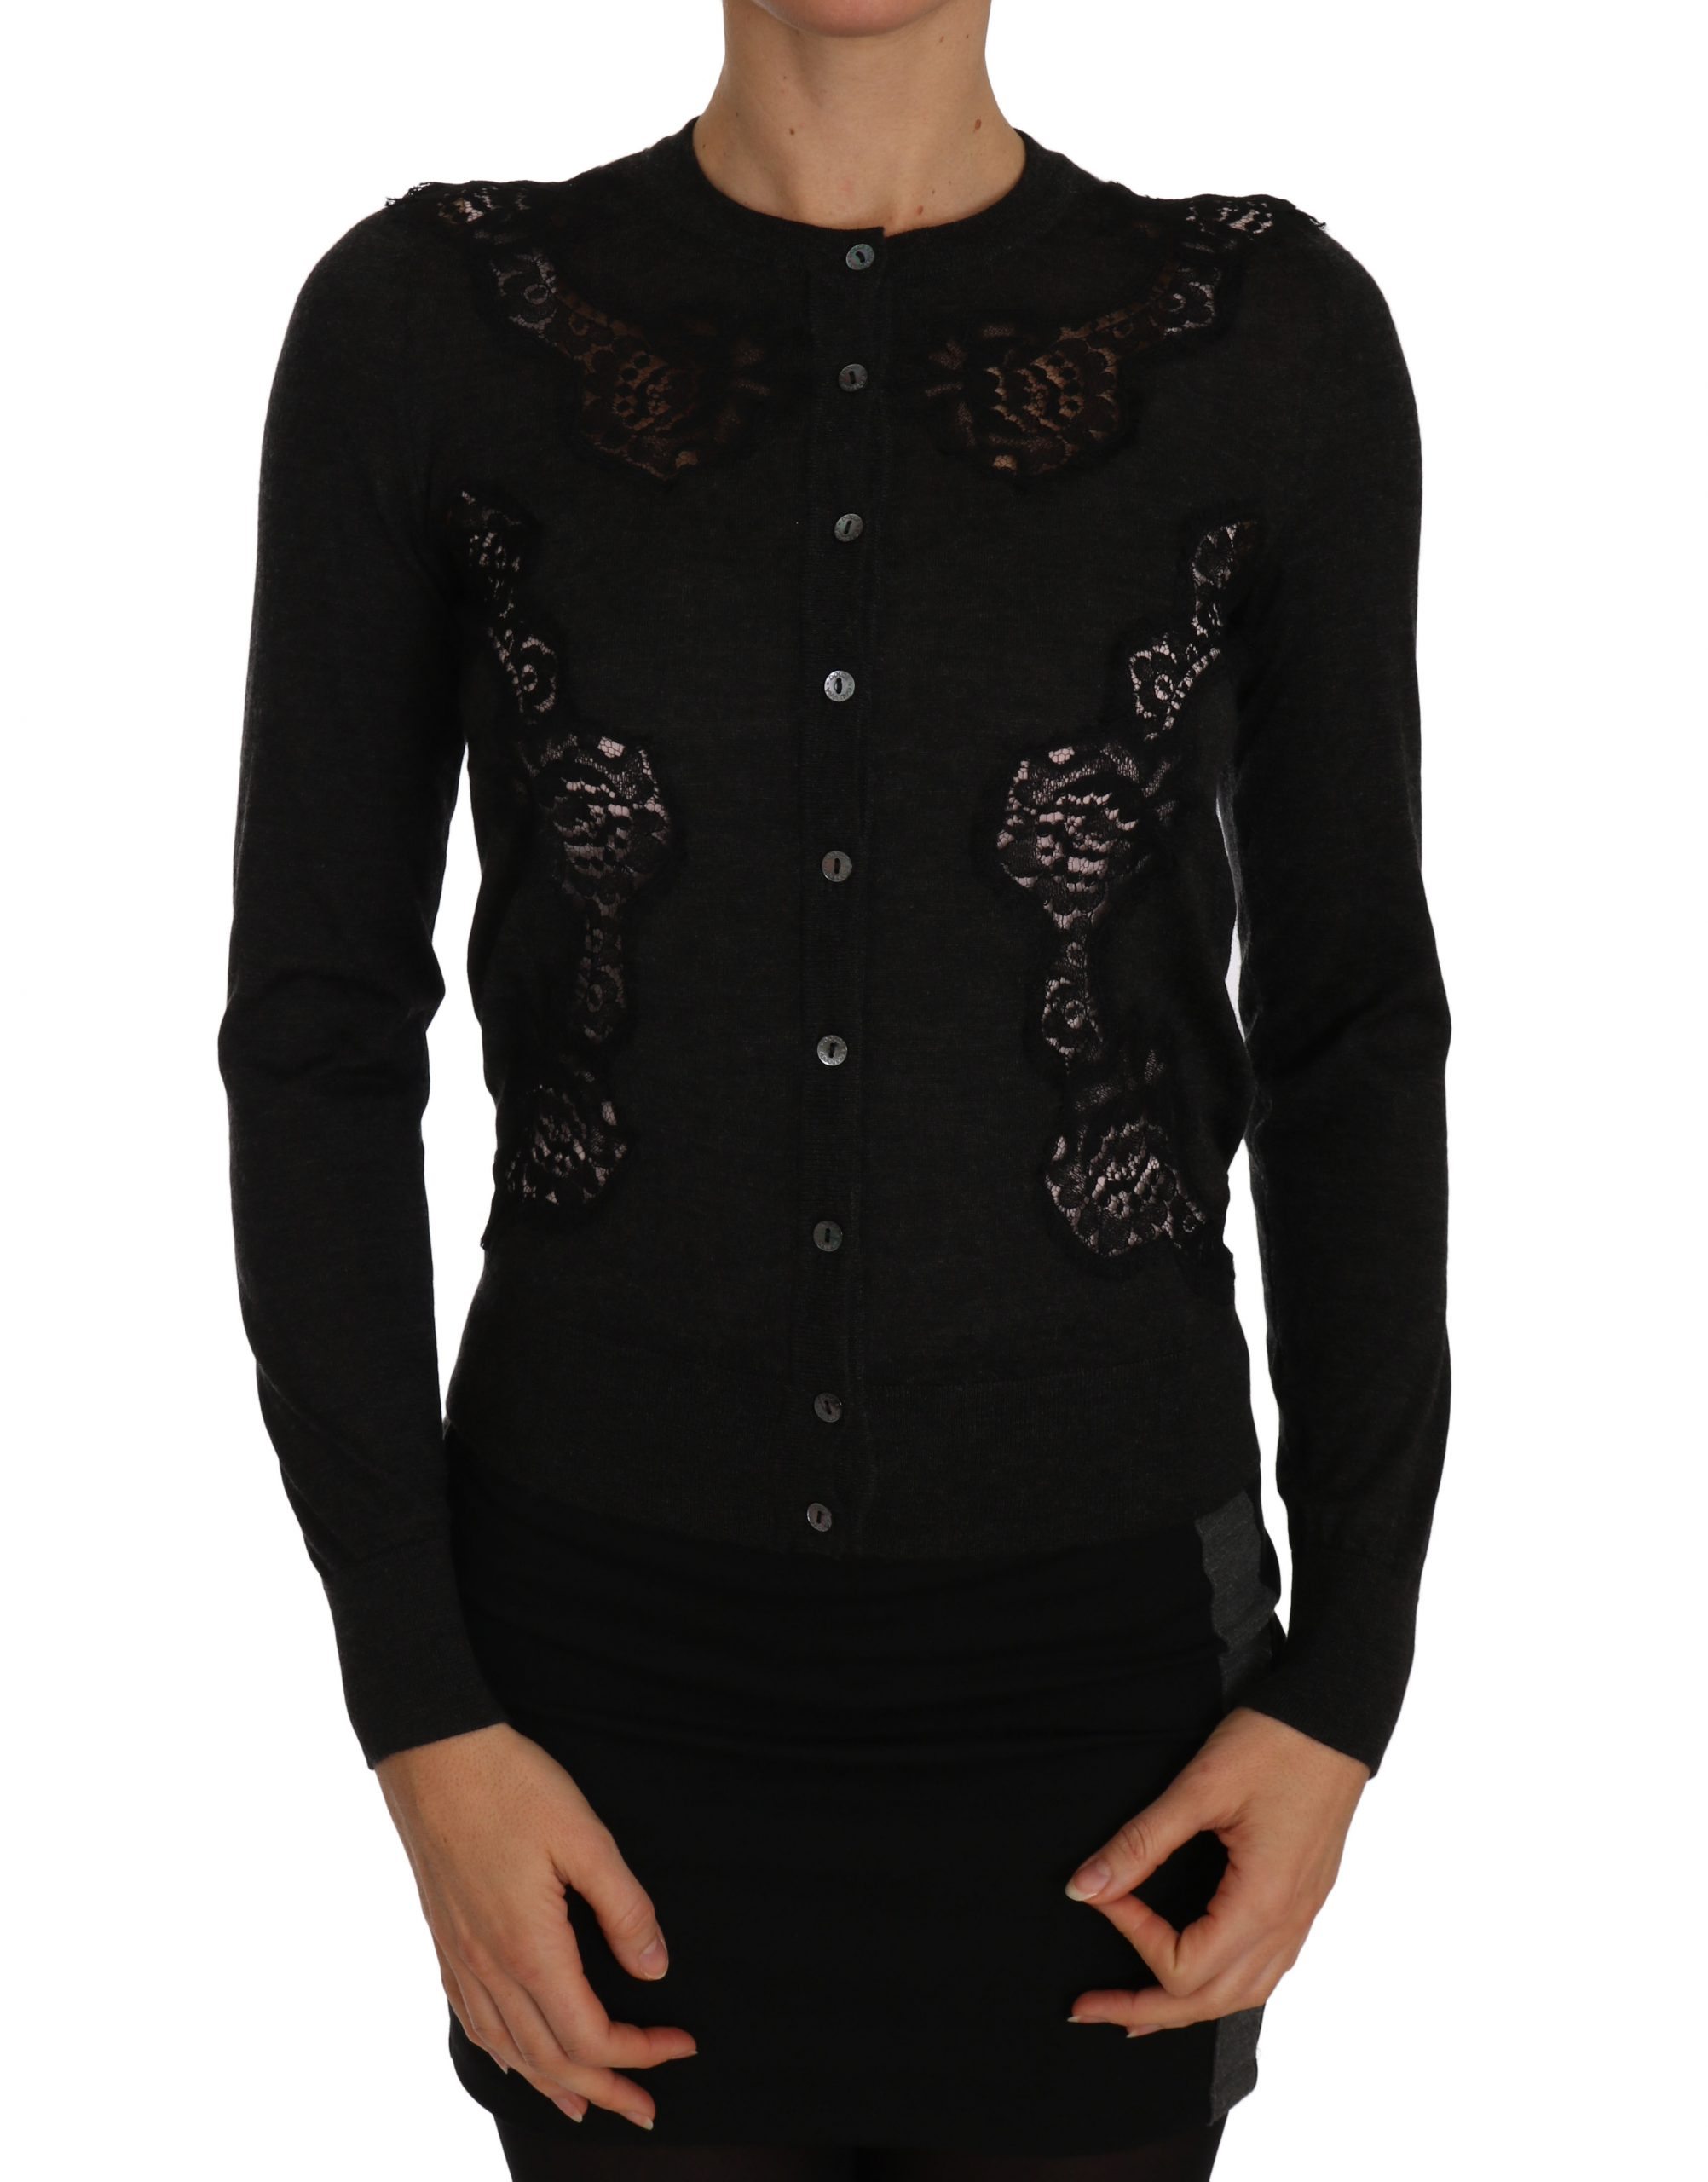 Dolce & Gabbana Women's Cashmere Lace Button Up Cardigan Gray TSH2258 - IT38|XS